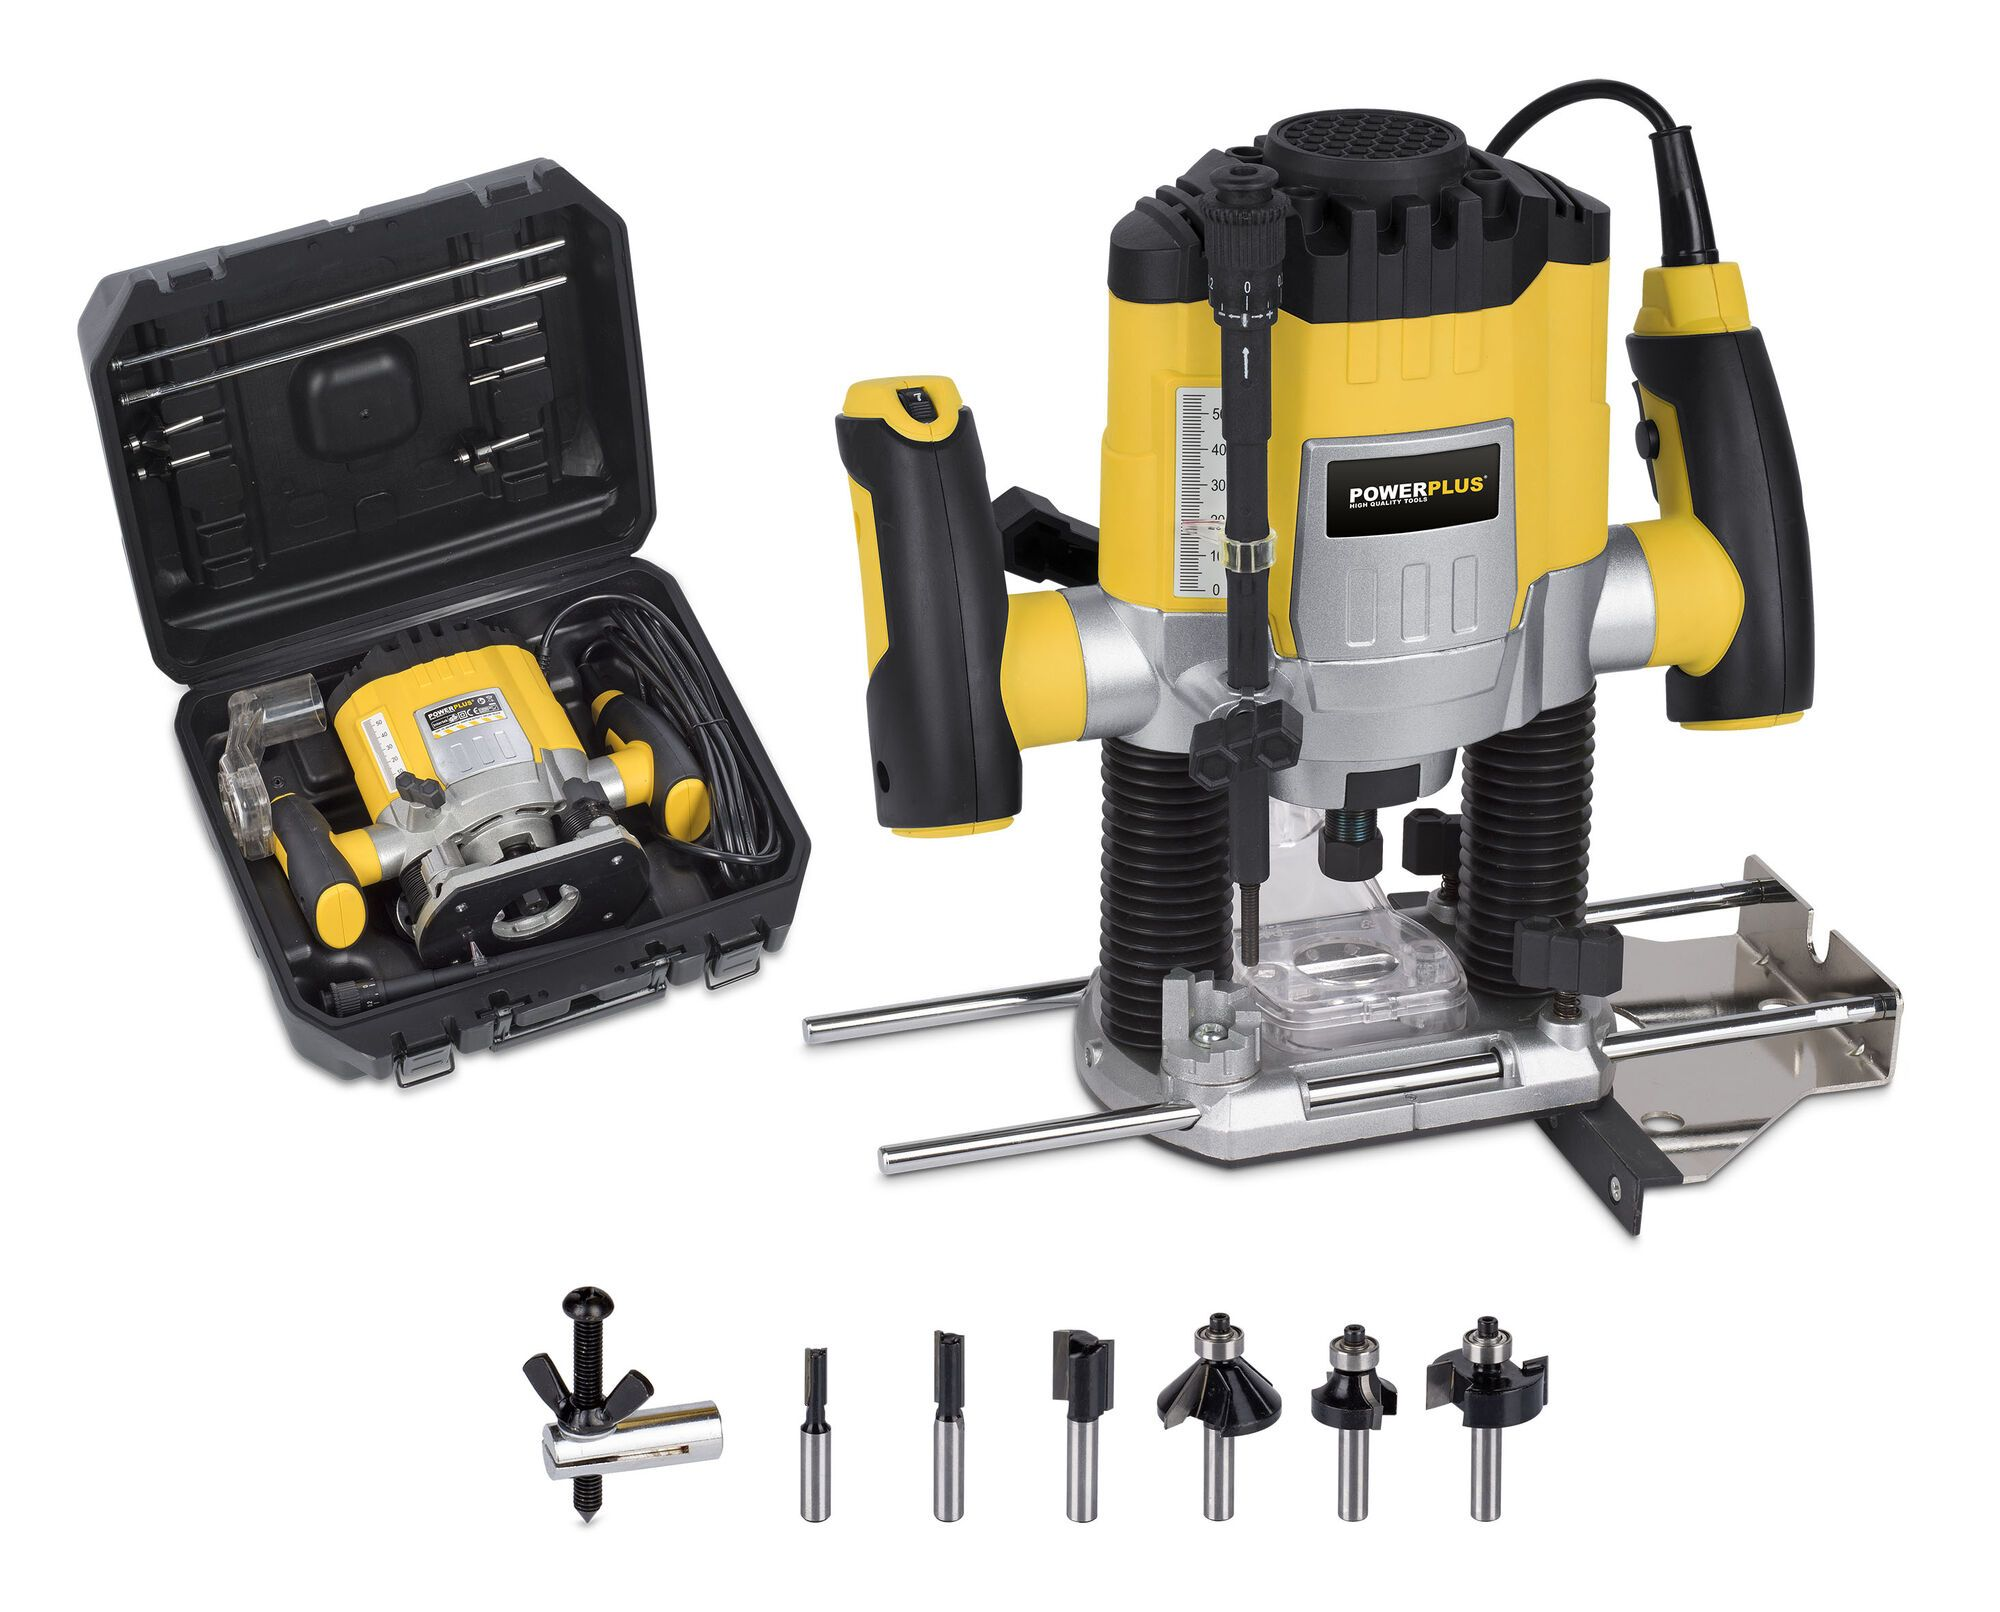 Powerplus POWX0910 Bovenfrees 1200W met 6 frezen | Bovenfreesmachine 6 + 8 mm (freesmachine)